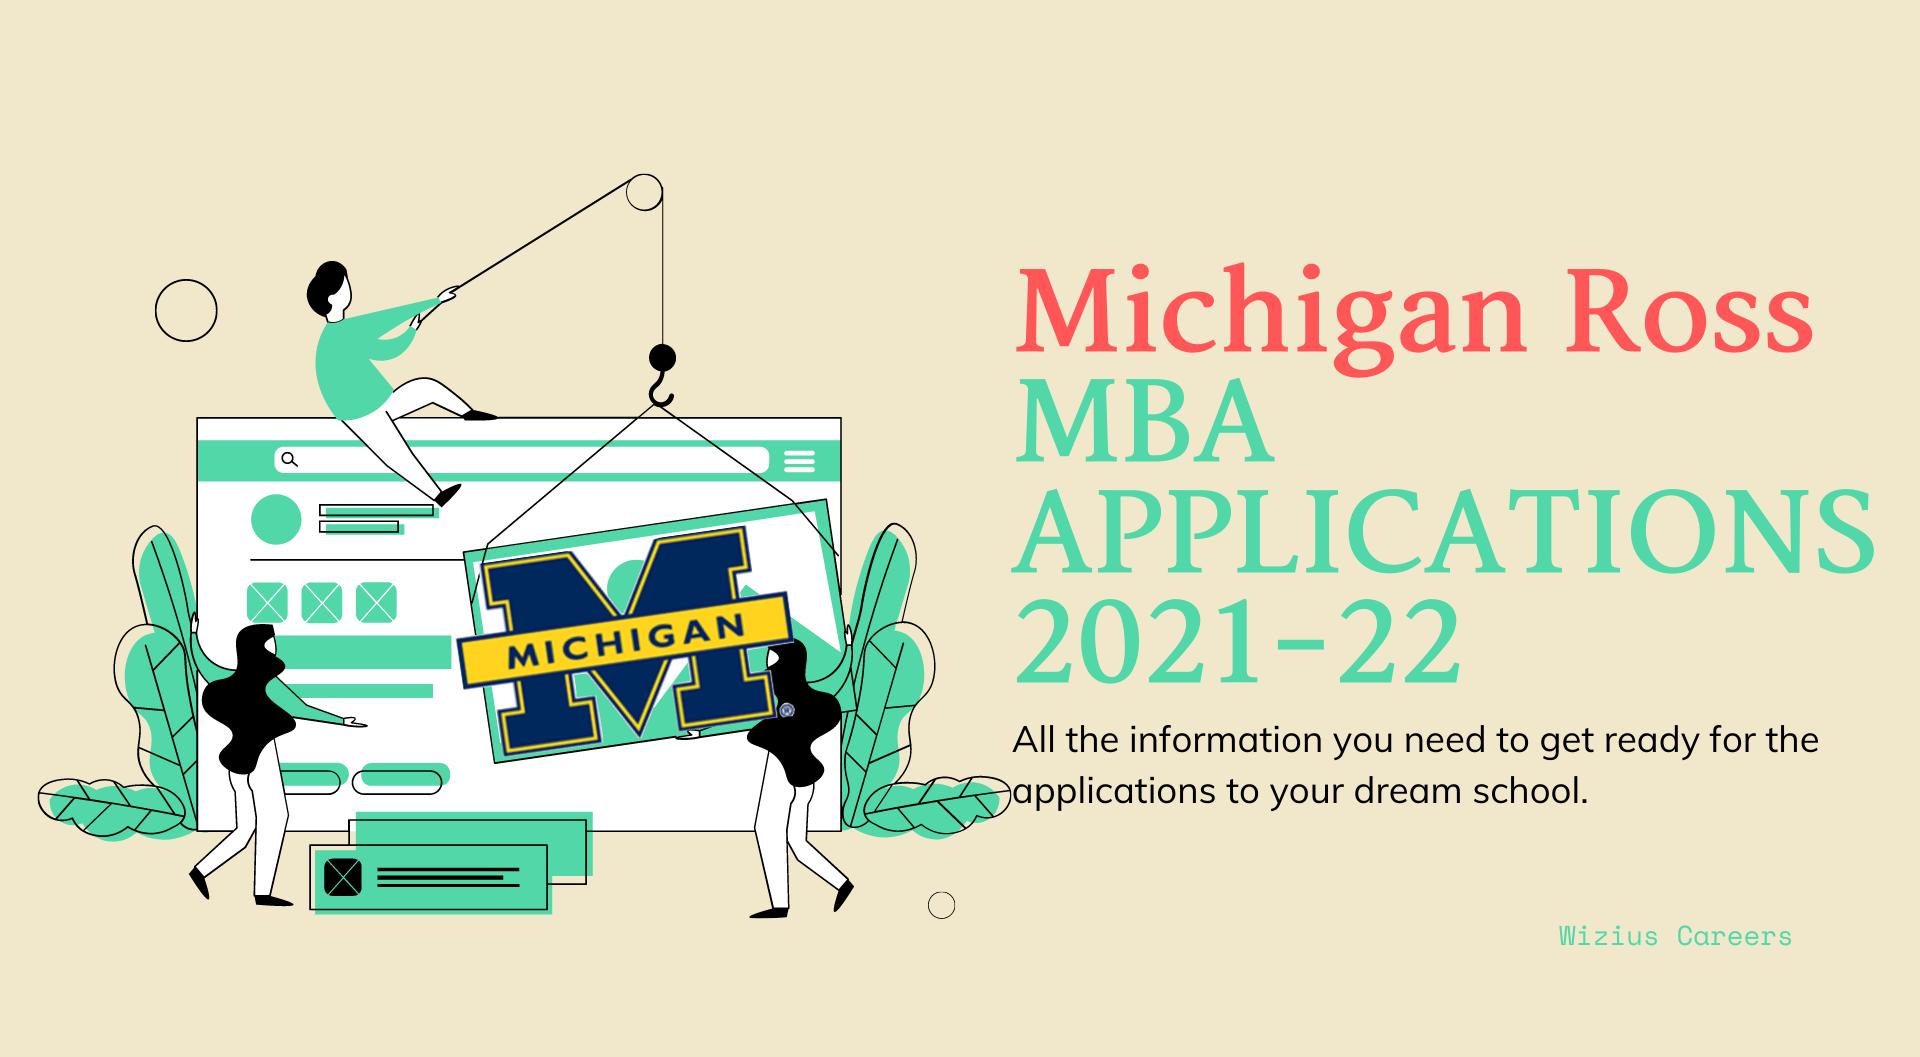 Michigan Ross MBA Applications 2021-22